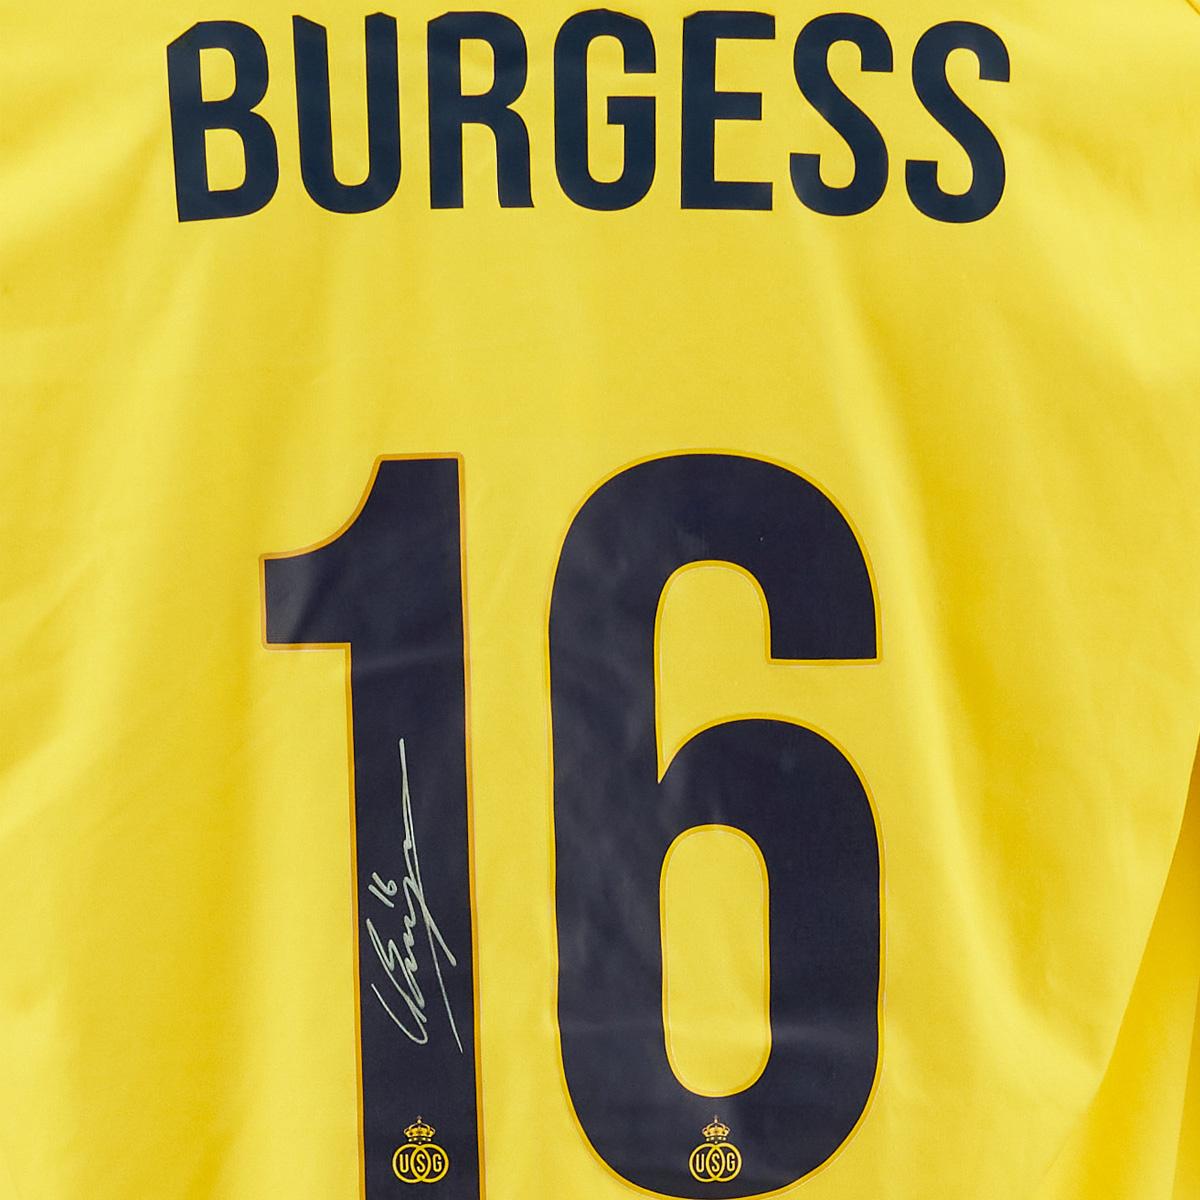 Topfanz #16 Christian Burgess